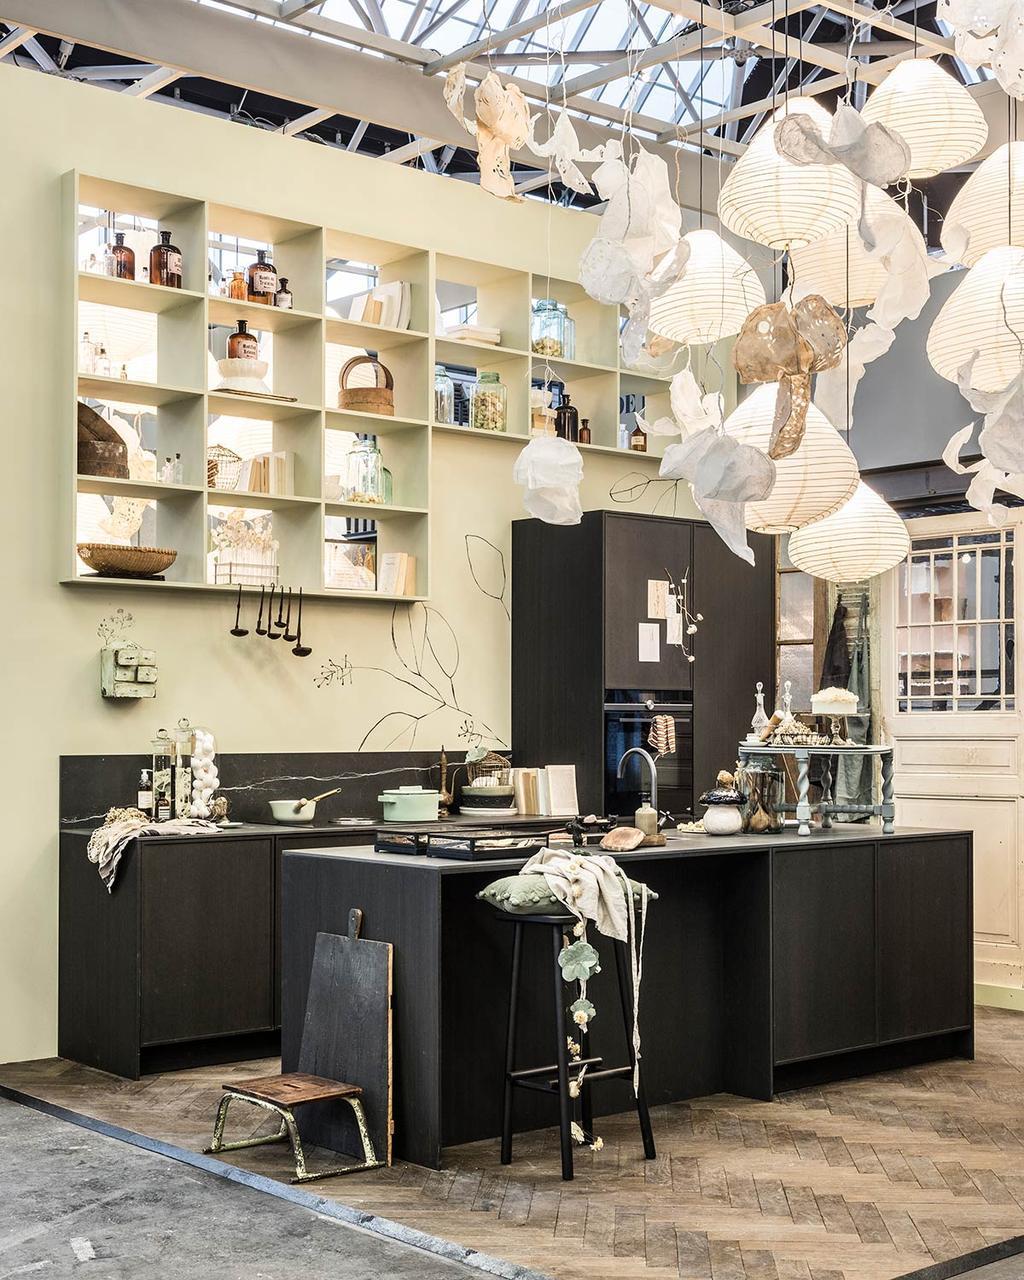 vtwonen huis 2018: keuken